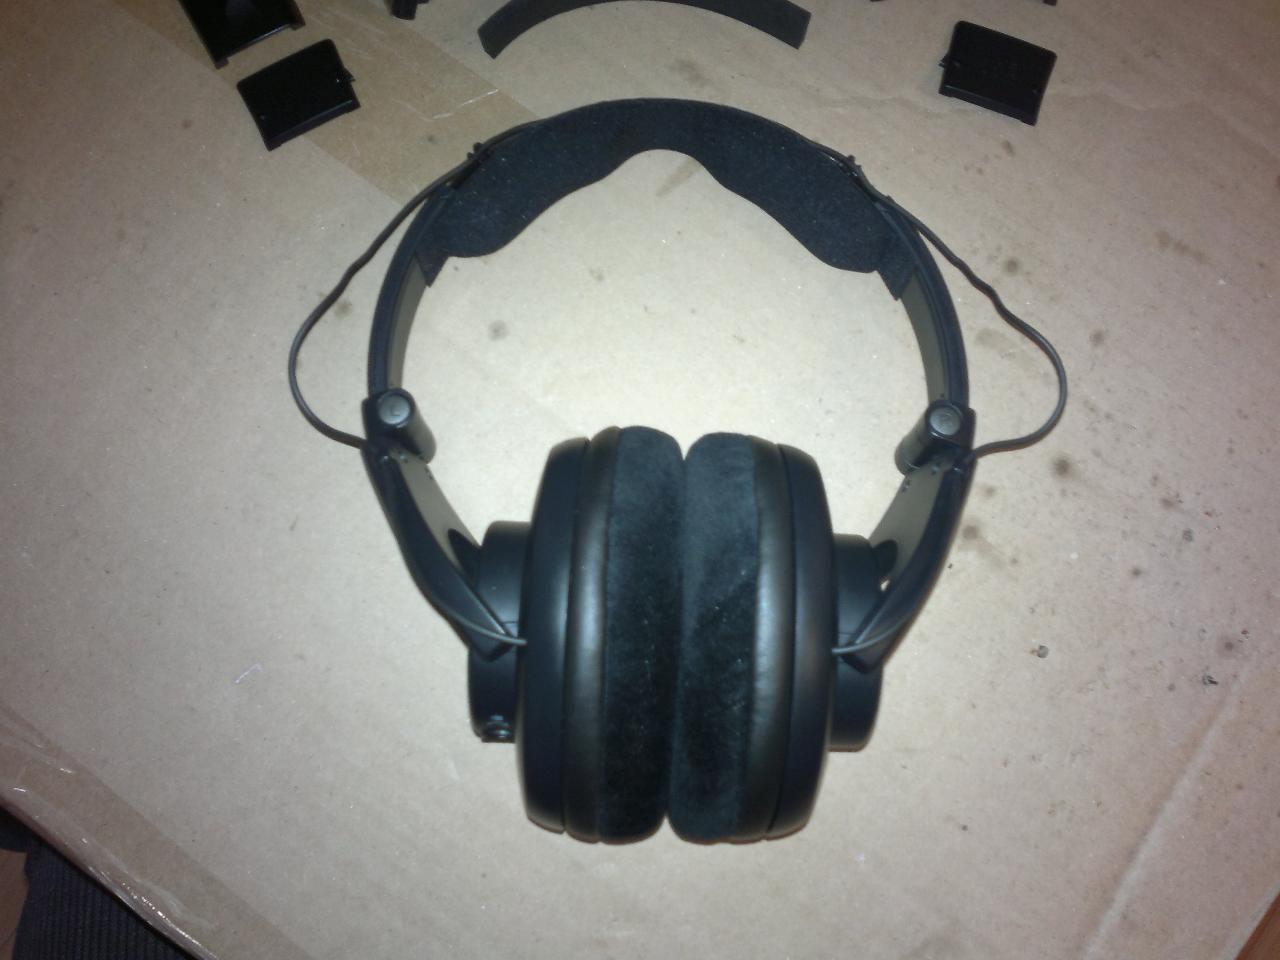 Hacking SRH440 headband, step #3. Mounting the Sennheiser HD650's headband pad to the...